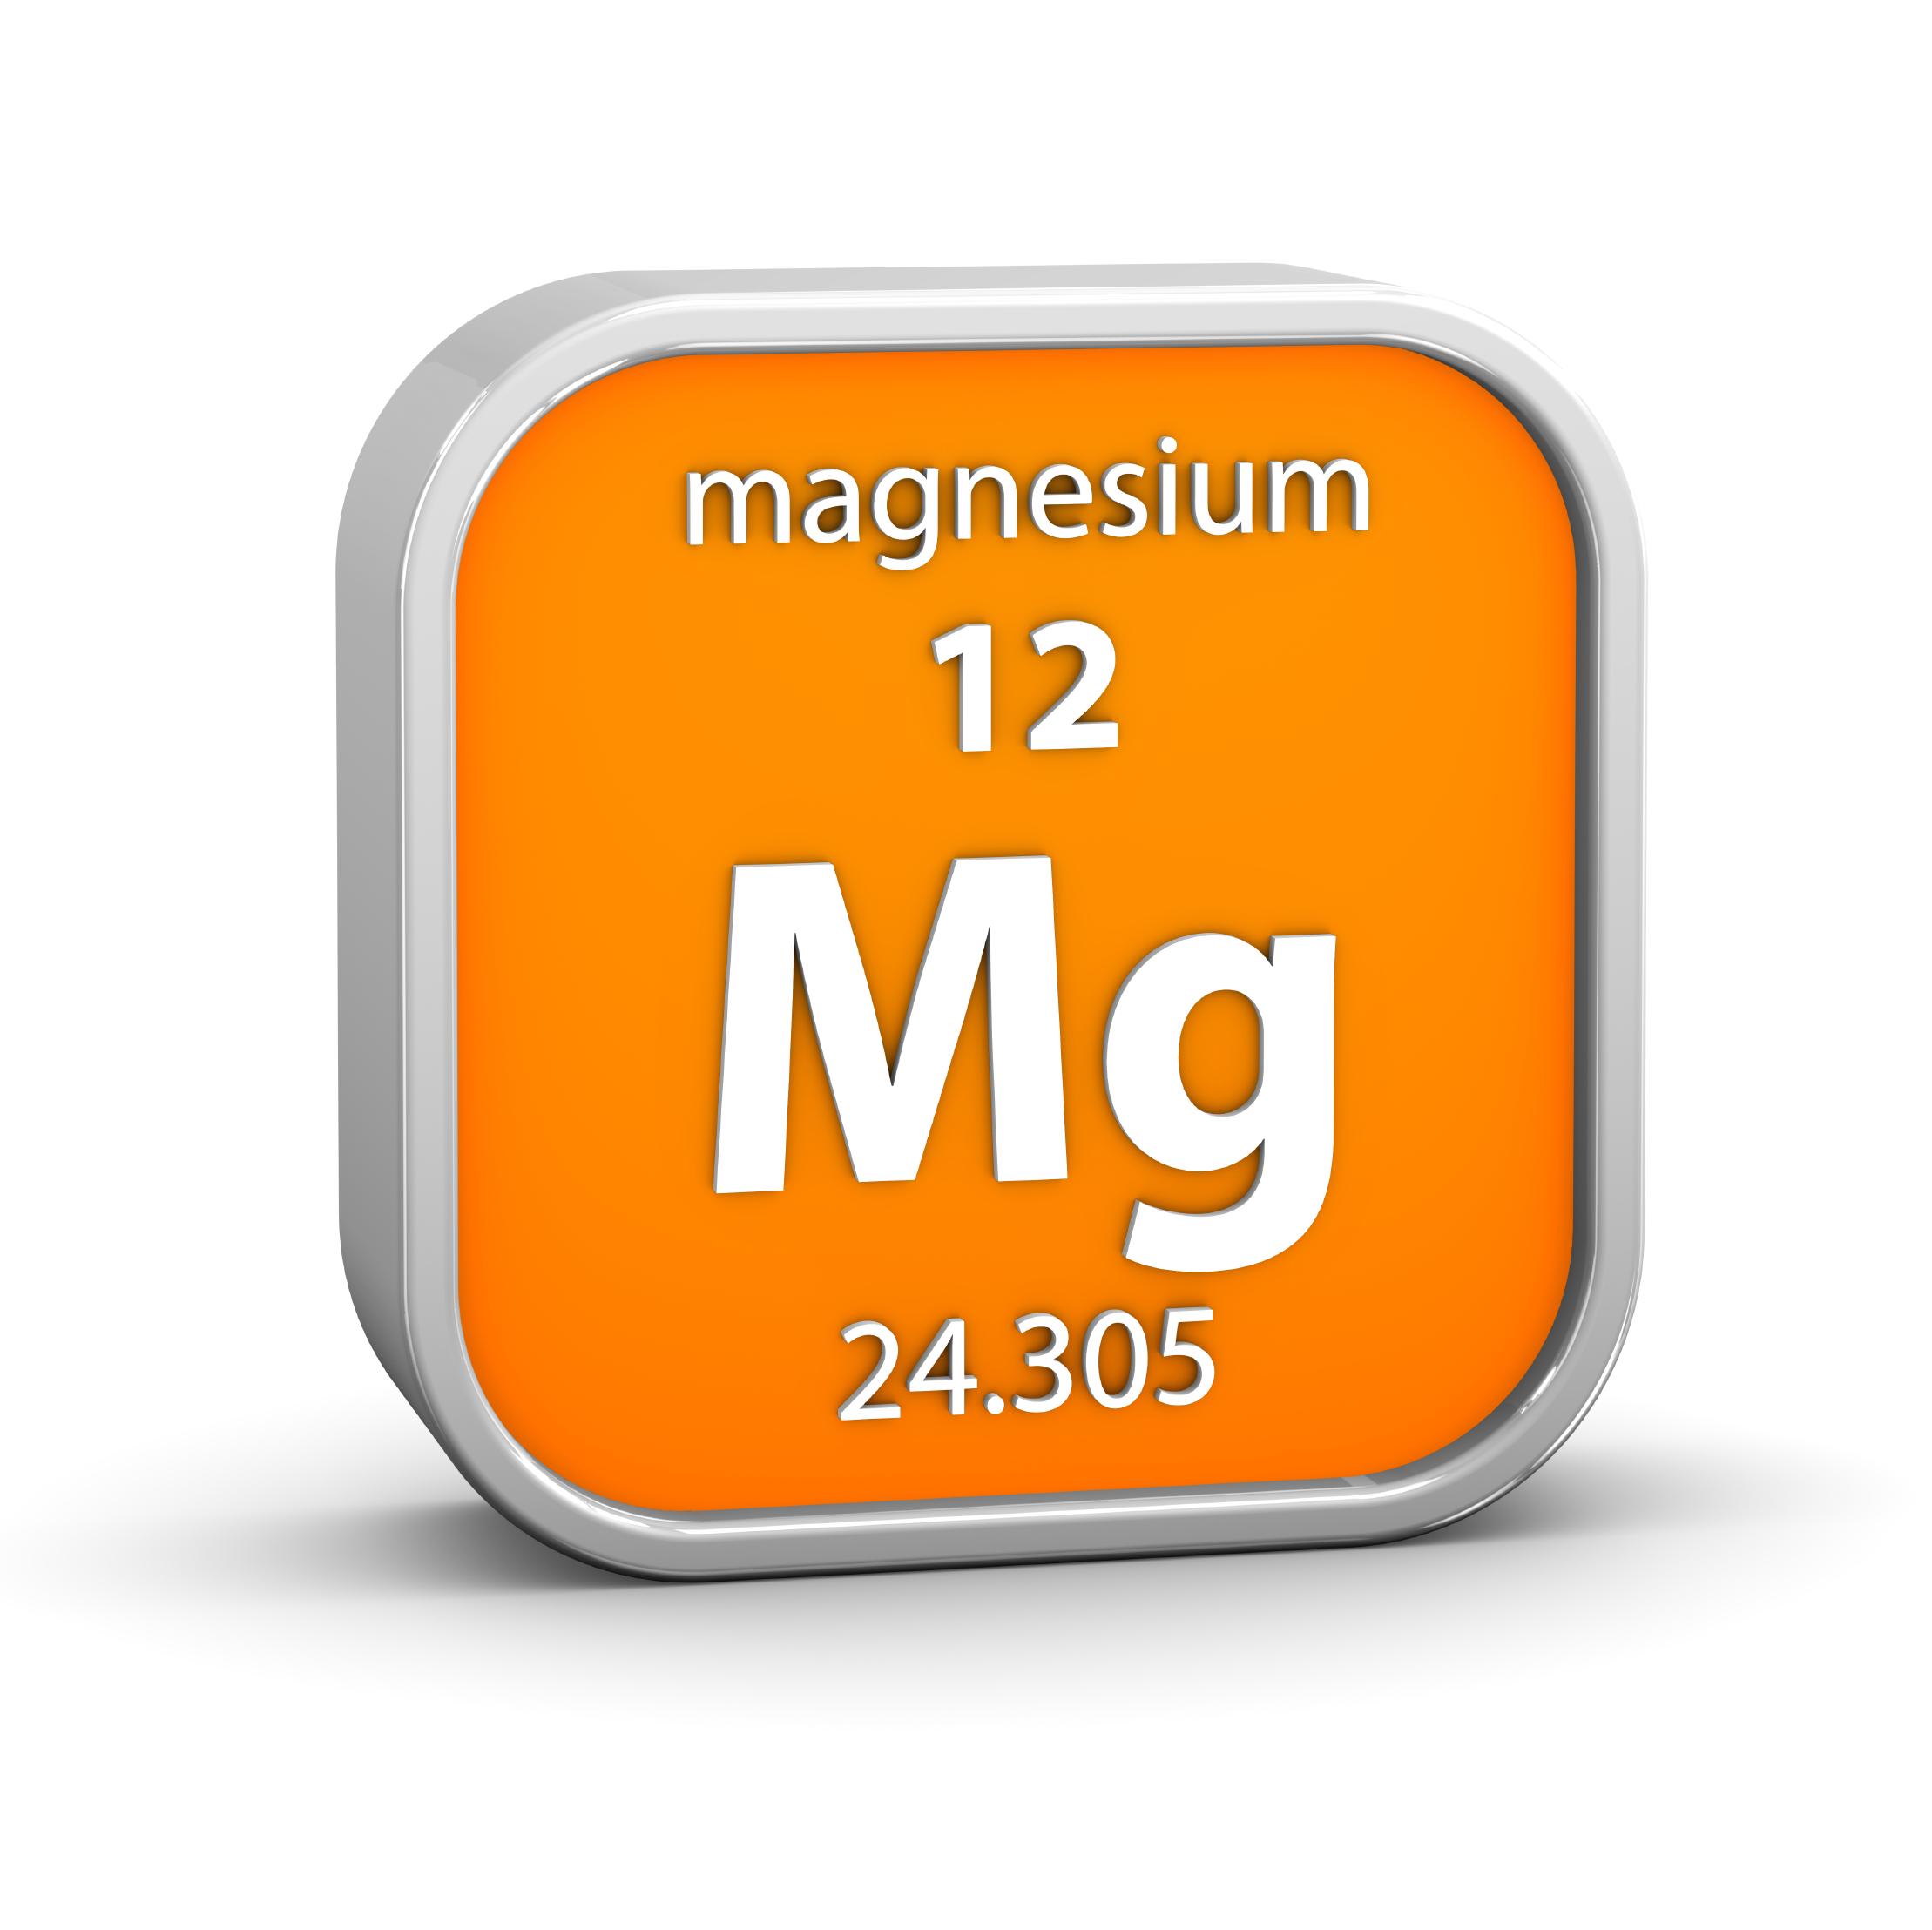 Optimized Magnesium - A More Complete Magnesium Supplement